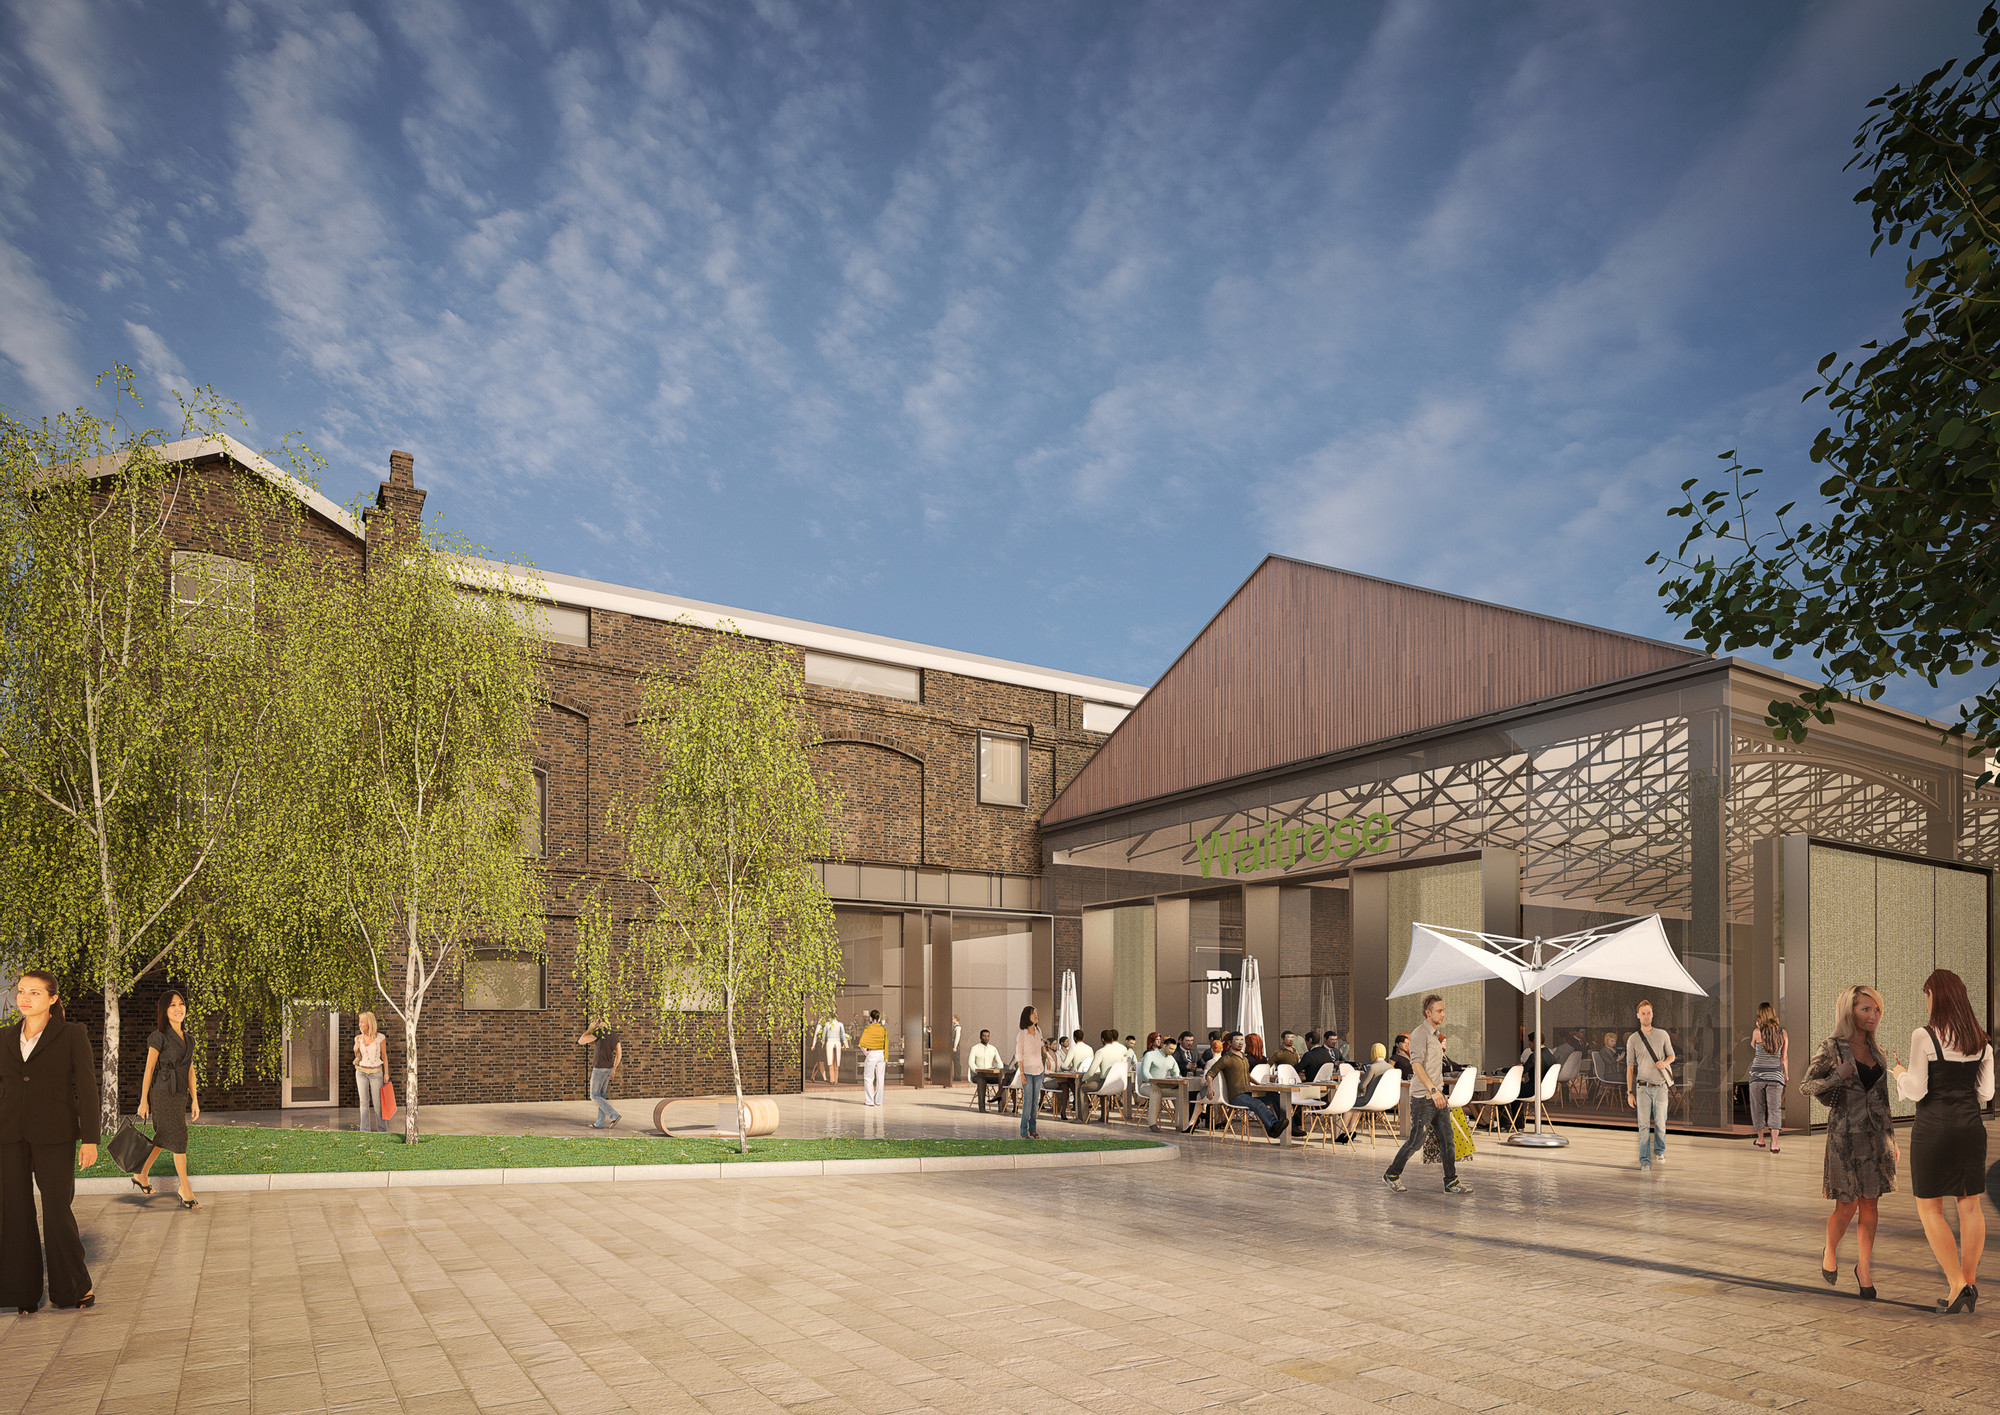 Bennetts Associates Unveil Plans for Latest Development in London's King's Cross, Visualisation. Image © Bennetts Associates